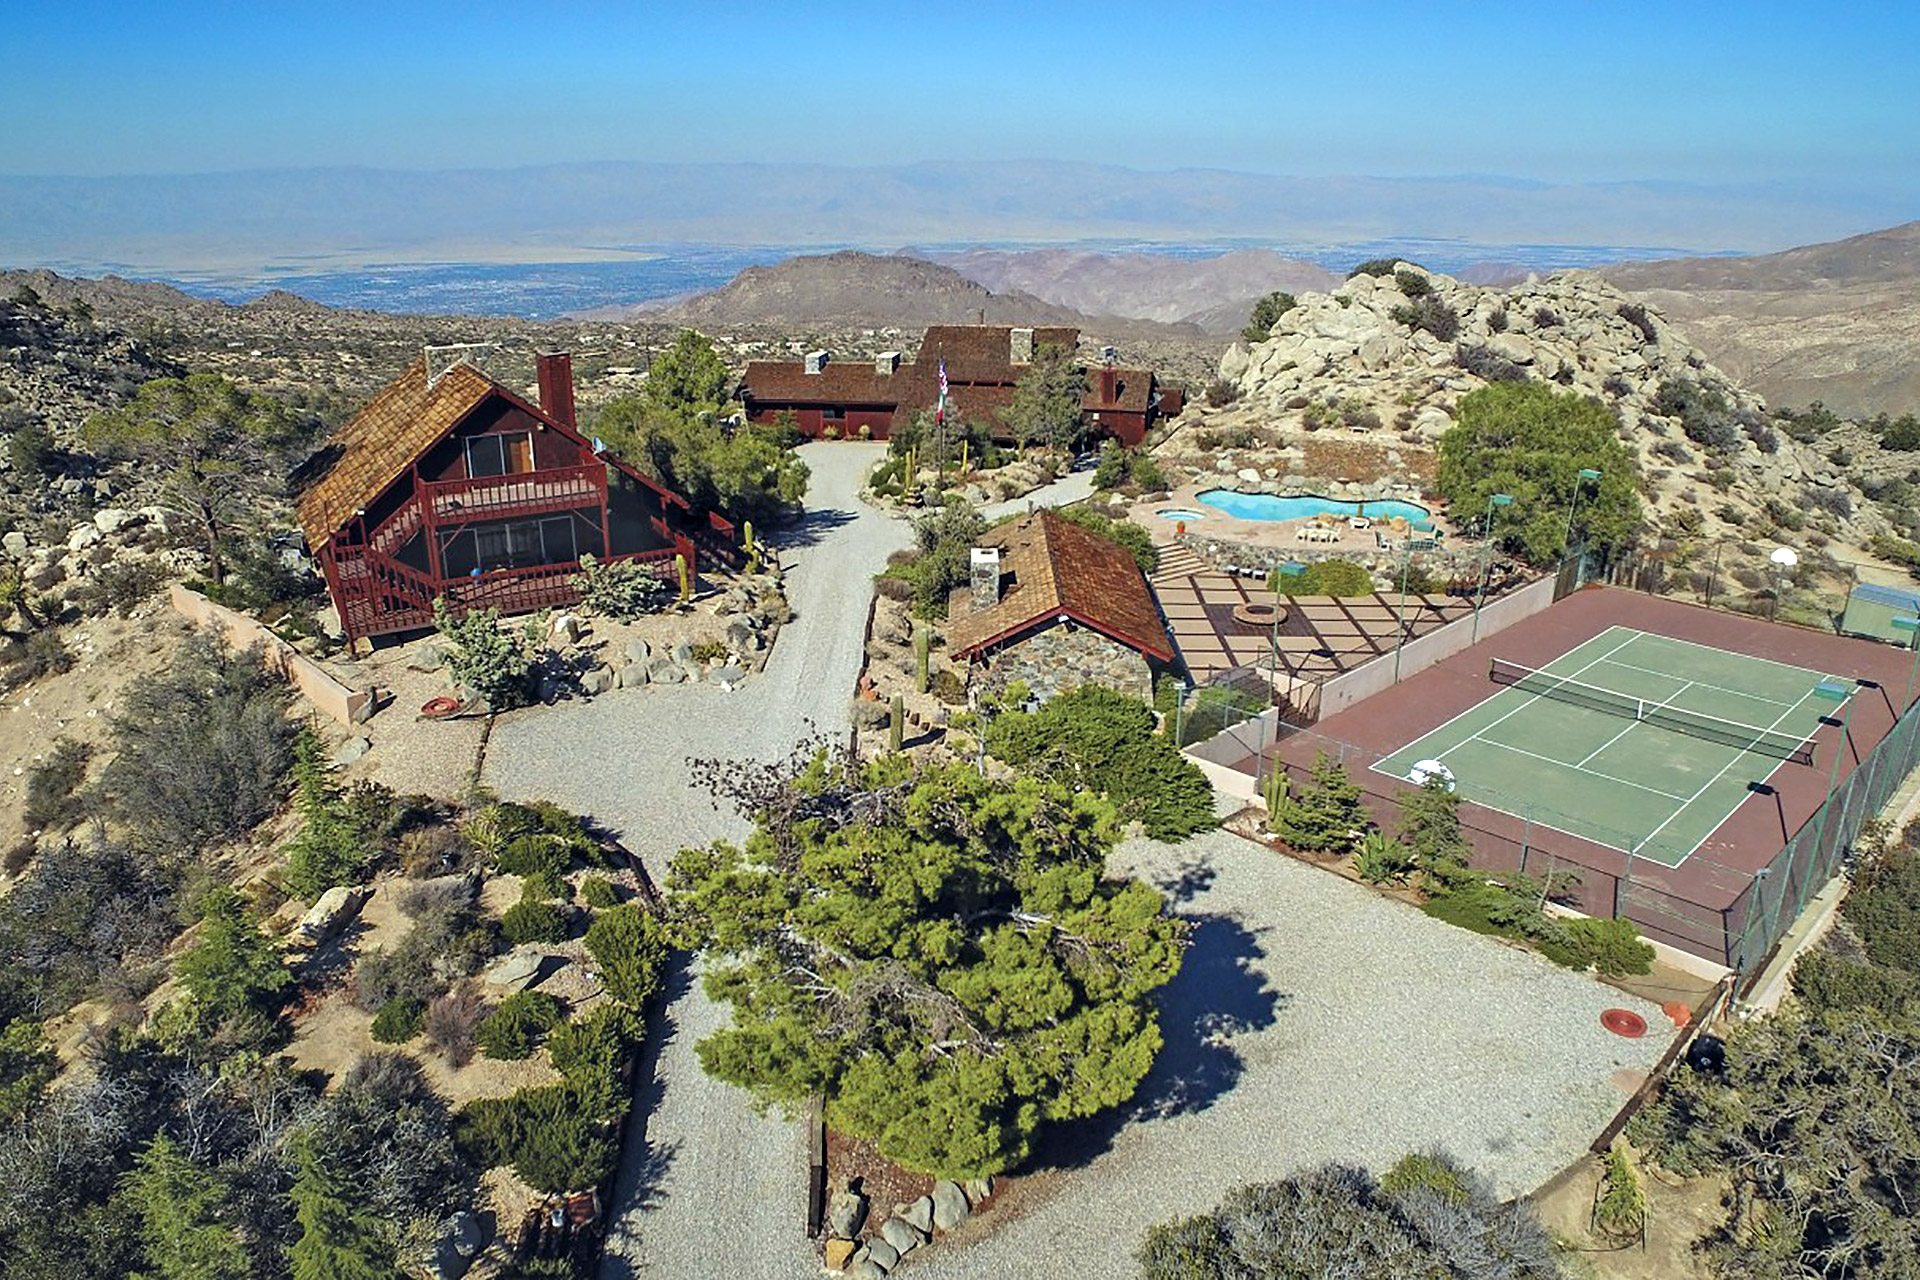 Frank Sinatra's Villa Maggio